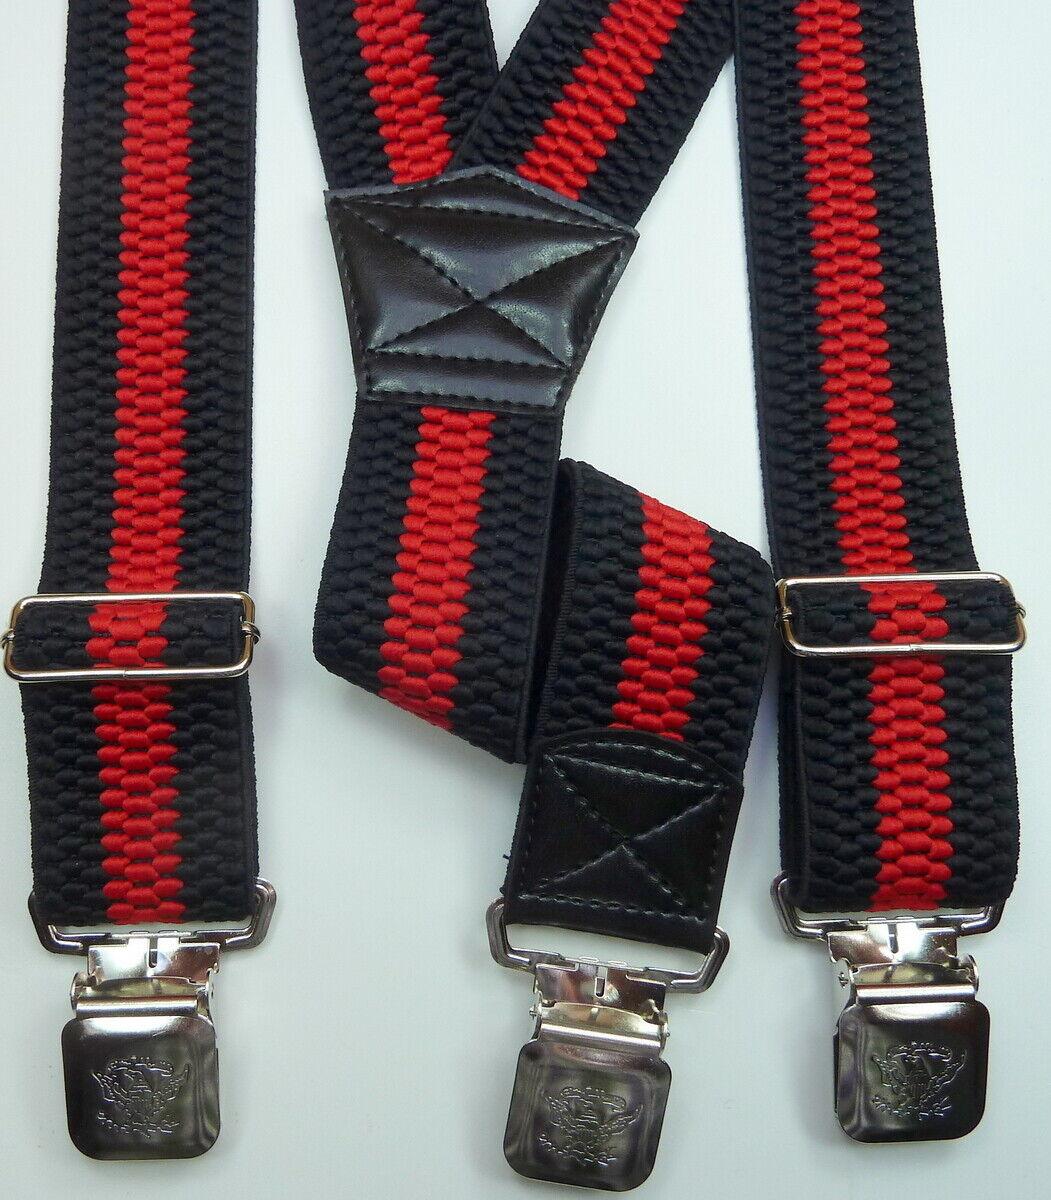 schwarz-roter Hosenträger für Biker,Alligatorclipslclips,115 cm lang,40 mm breit